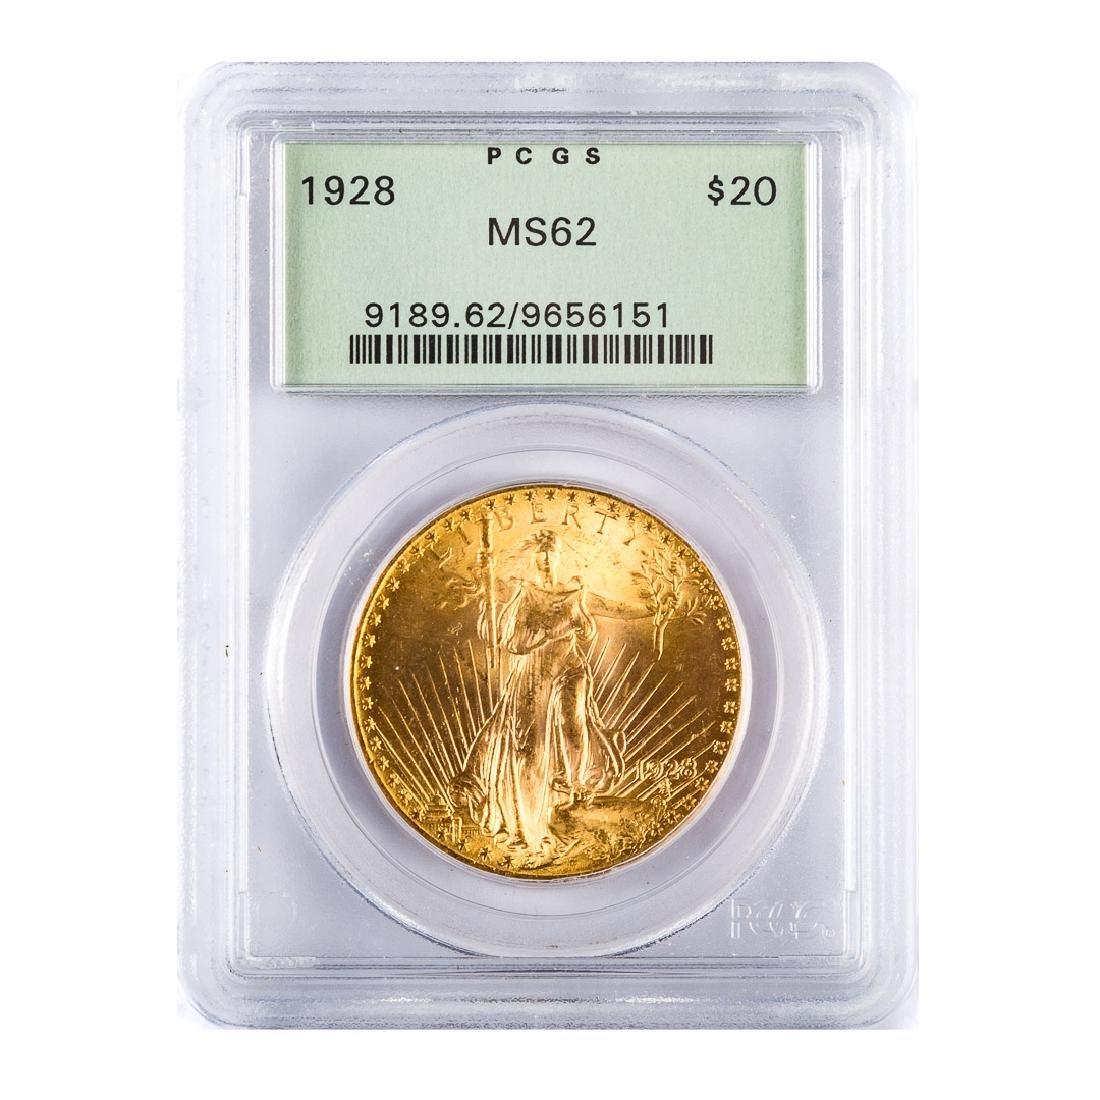 [US] 1928 $20 St. Gaudens PCGS MS62 OGH